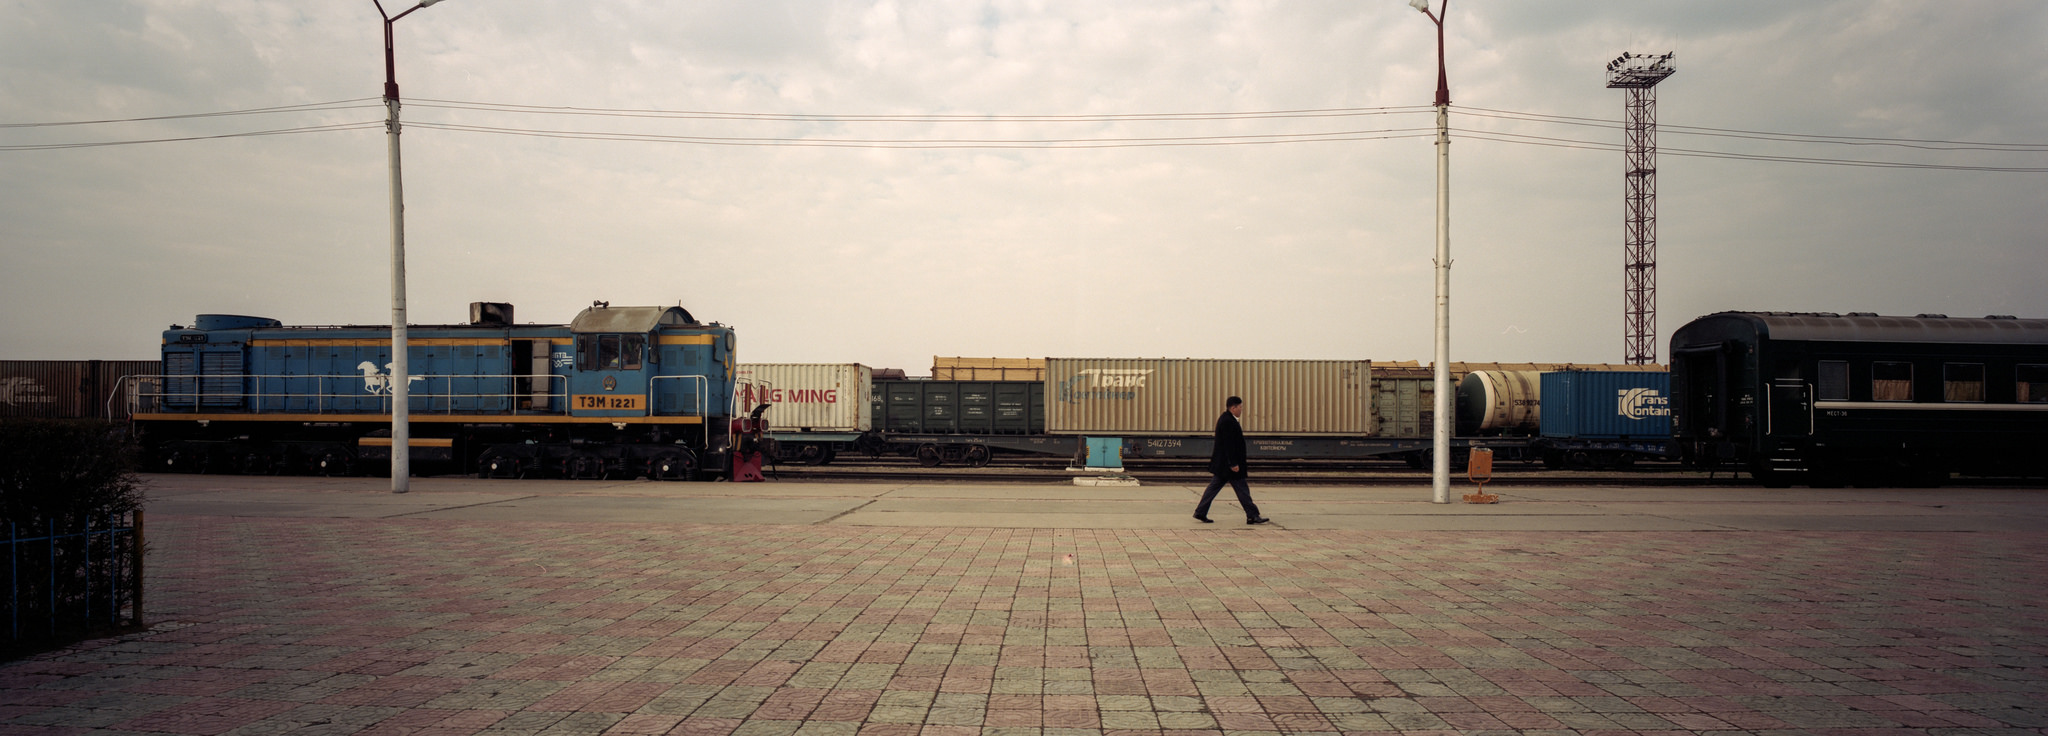 The long wait at the border P614   Super Angulon 58mm   Kodak Portra 400